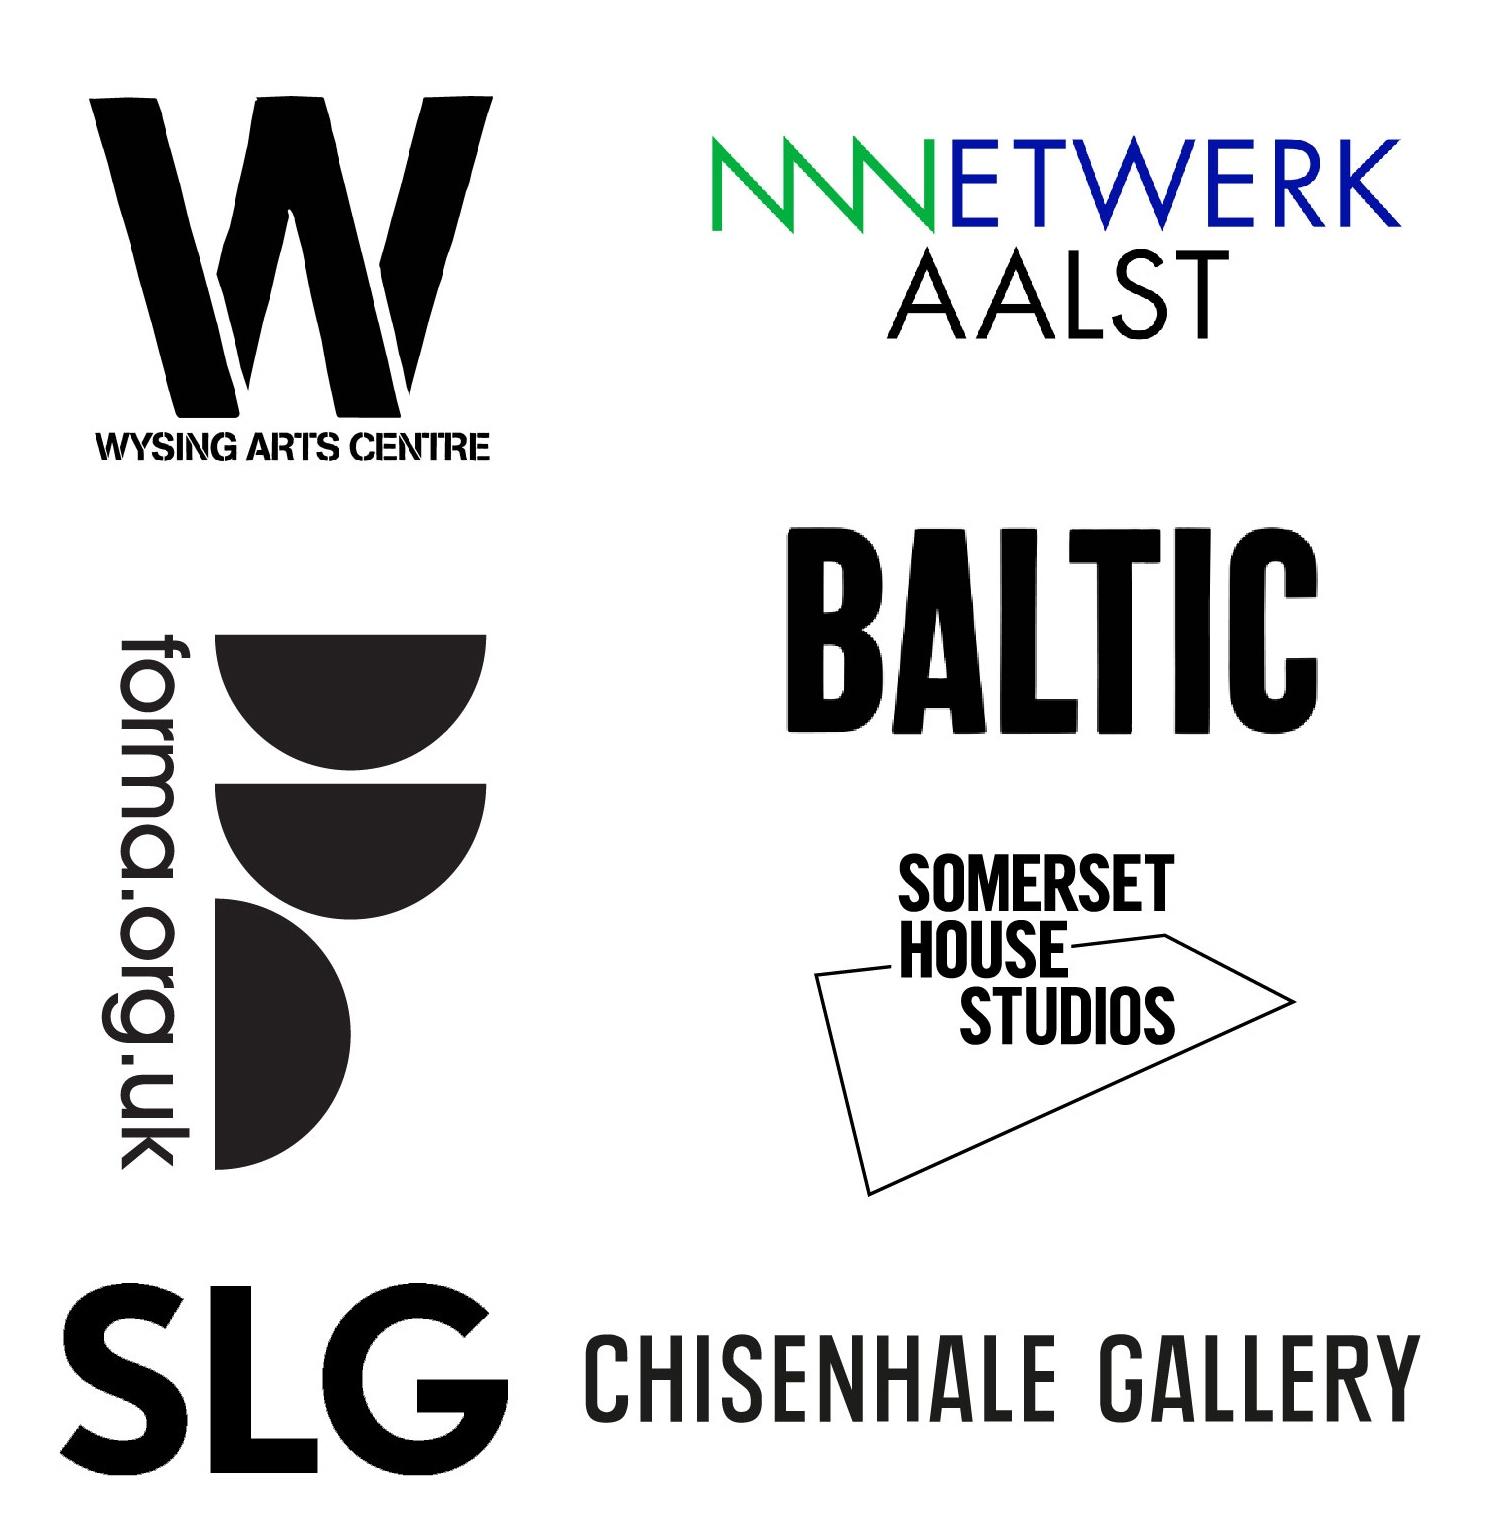 logos-again2.jpg#asset:4965